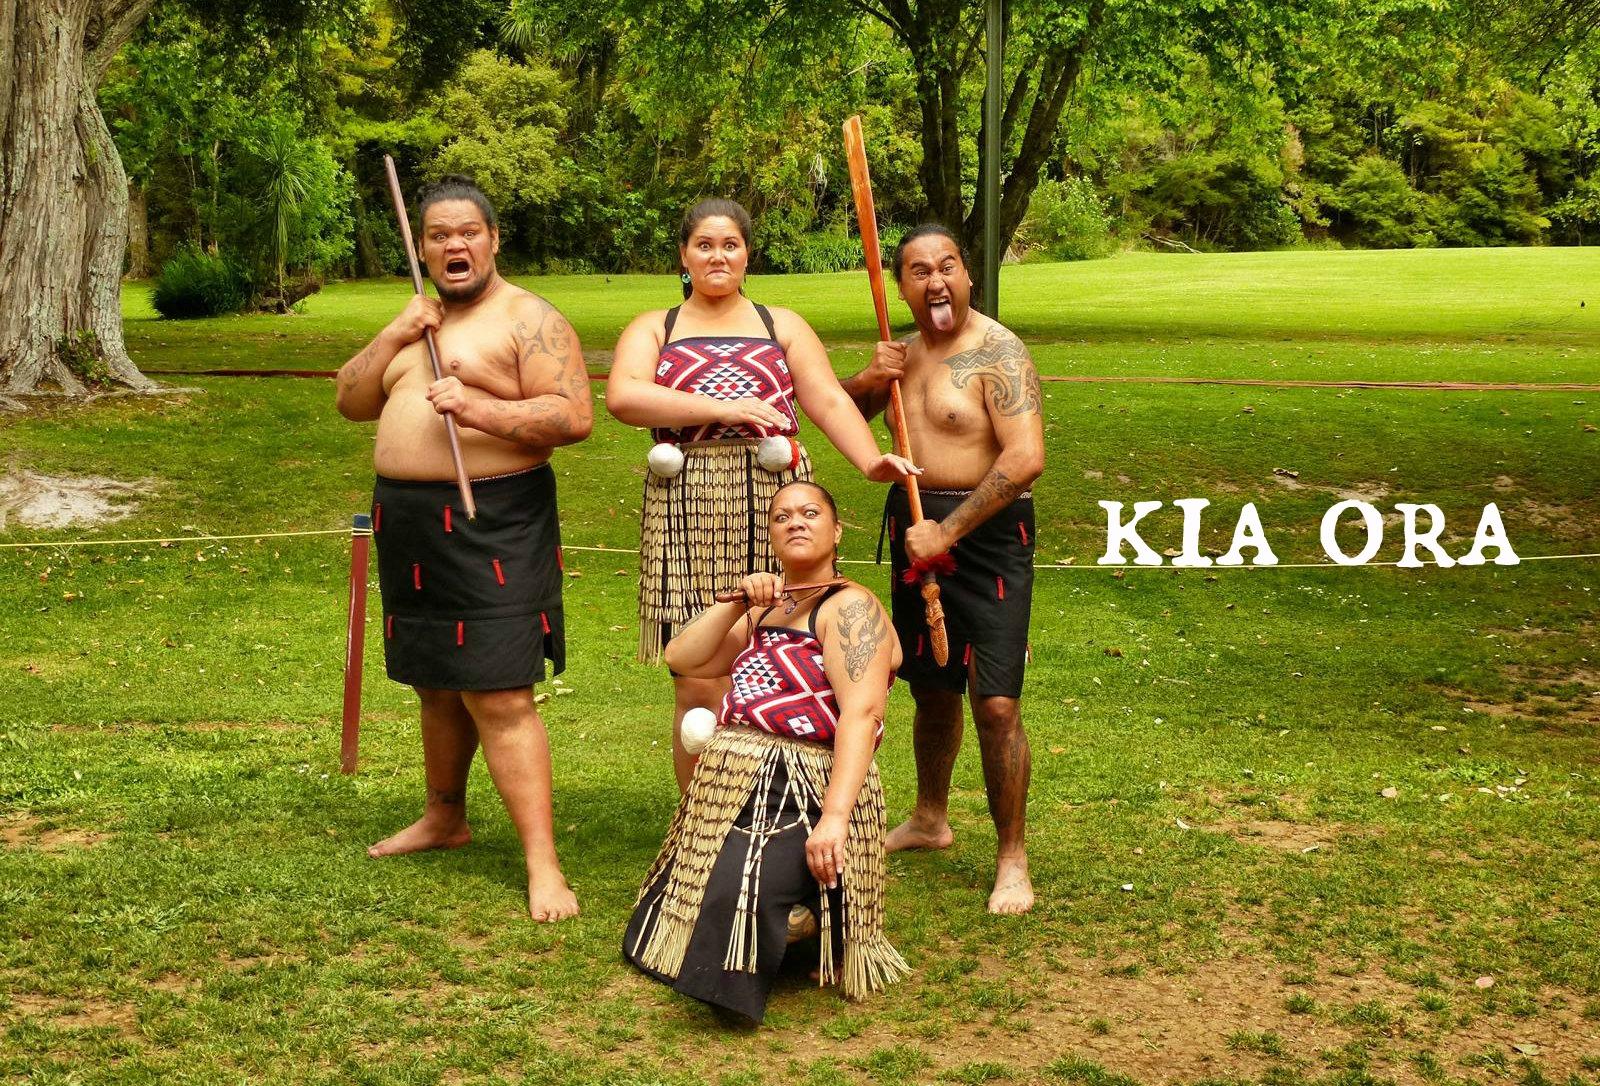 Amoklauf Neuseeland Video Pinterest: Maori In Neuseeland: Waitangi, Haka Und Hongi